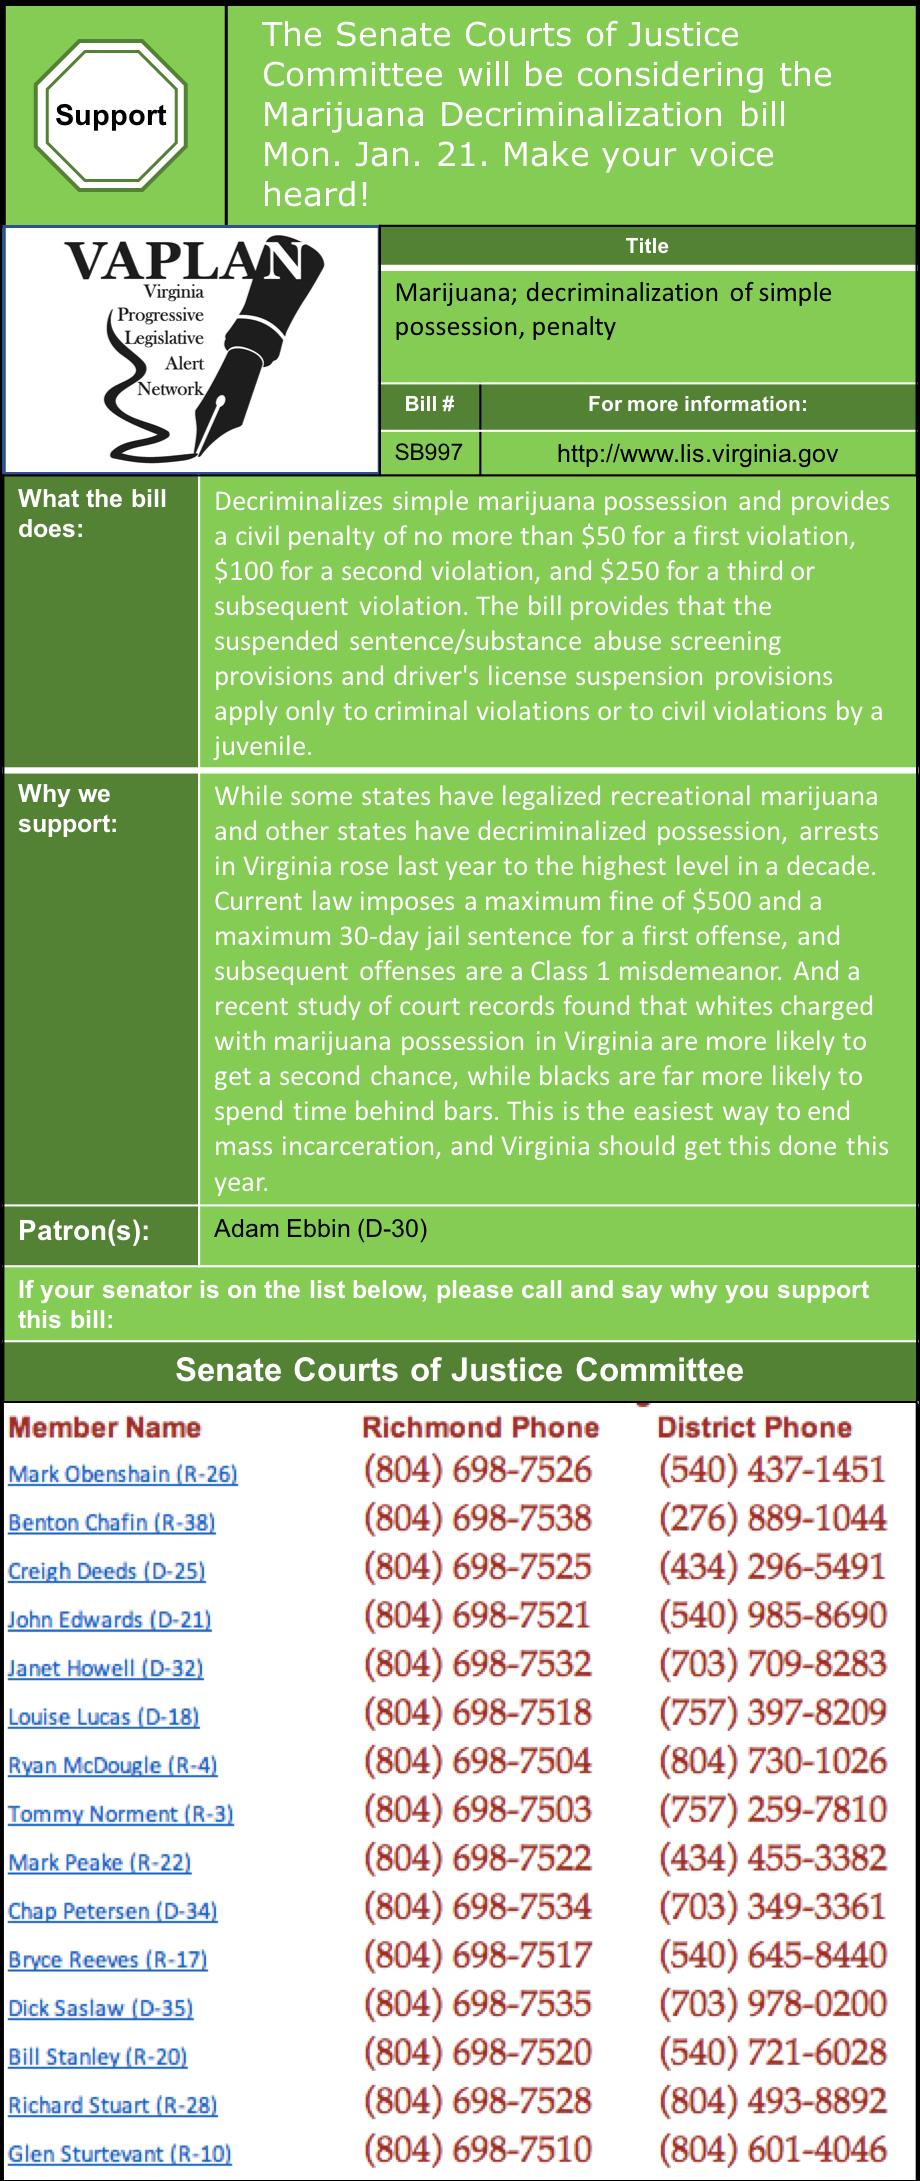 ALERT: Last chance this session to pass marijuana decriminalization heard in Senate Courts of Justice Mon. Jan. 21!